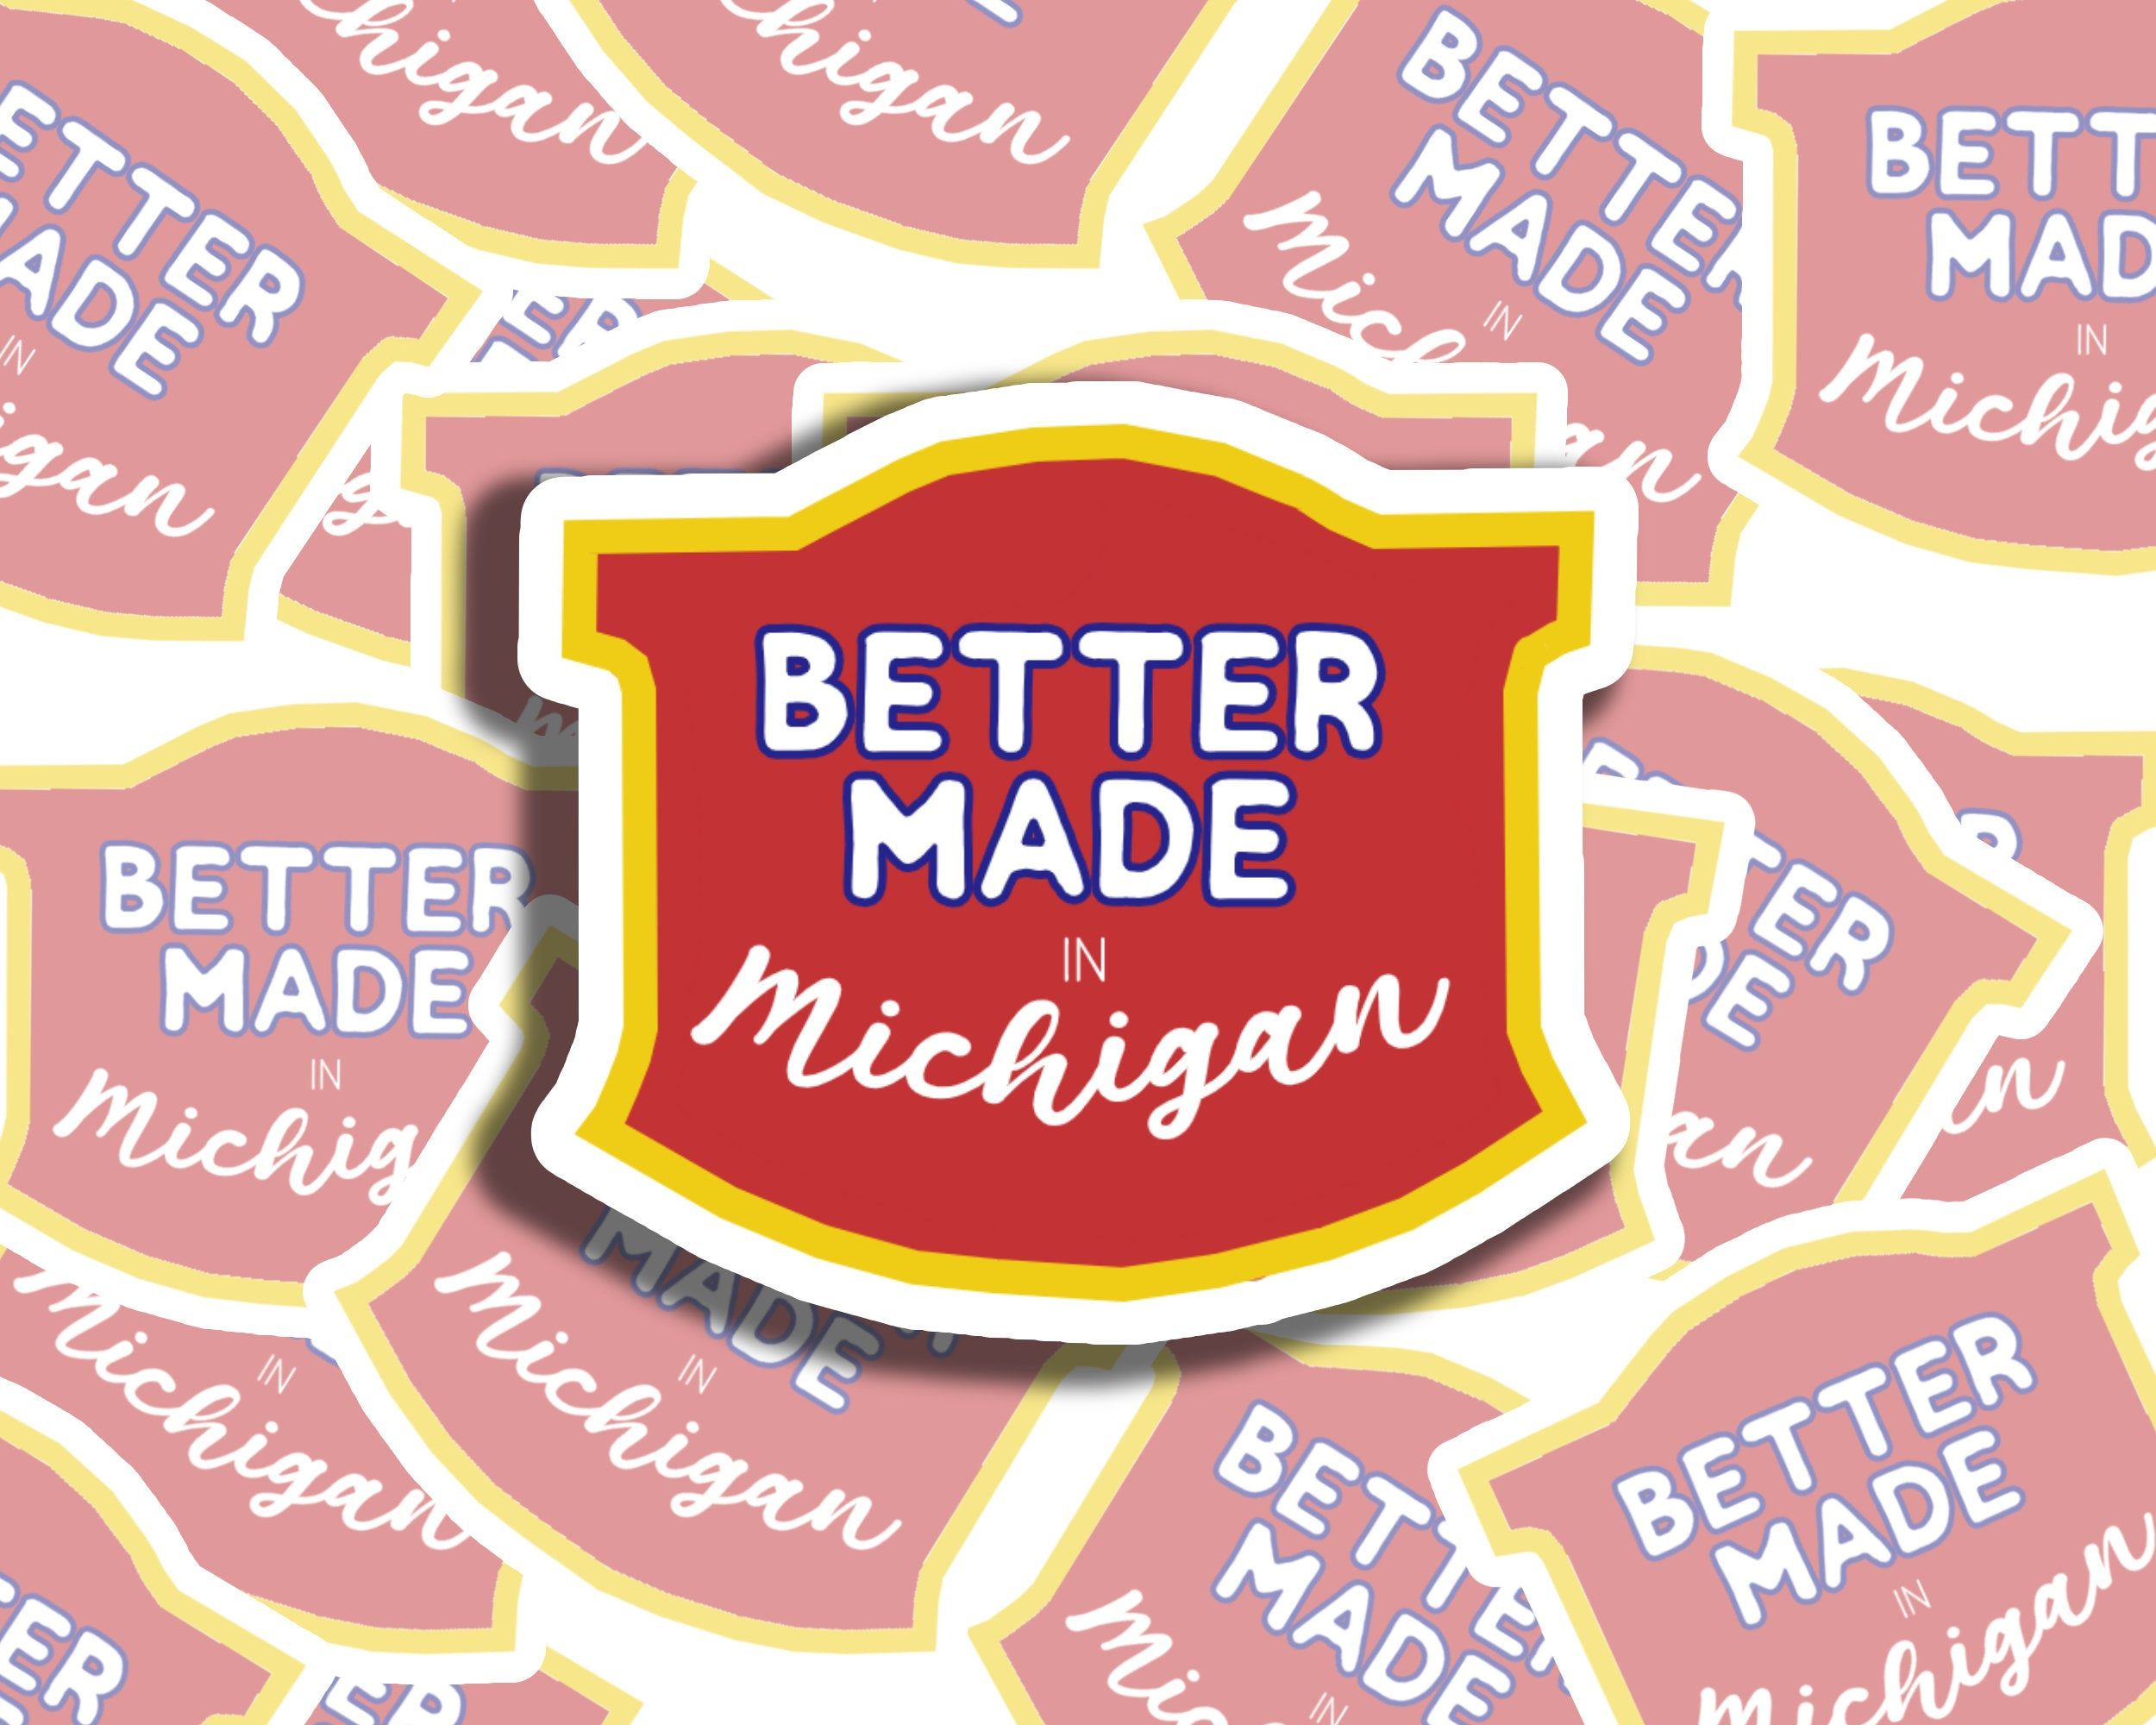 Better Made In Michigan Sticker State Of Michigan Chips Detroit Laptop Water Bottle Sticker Decal Michigan Sticker Michigan State Of Michigan [ jpg ]